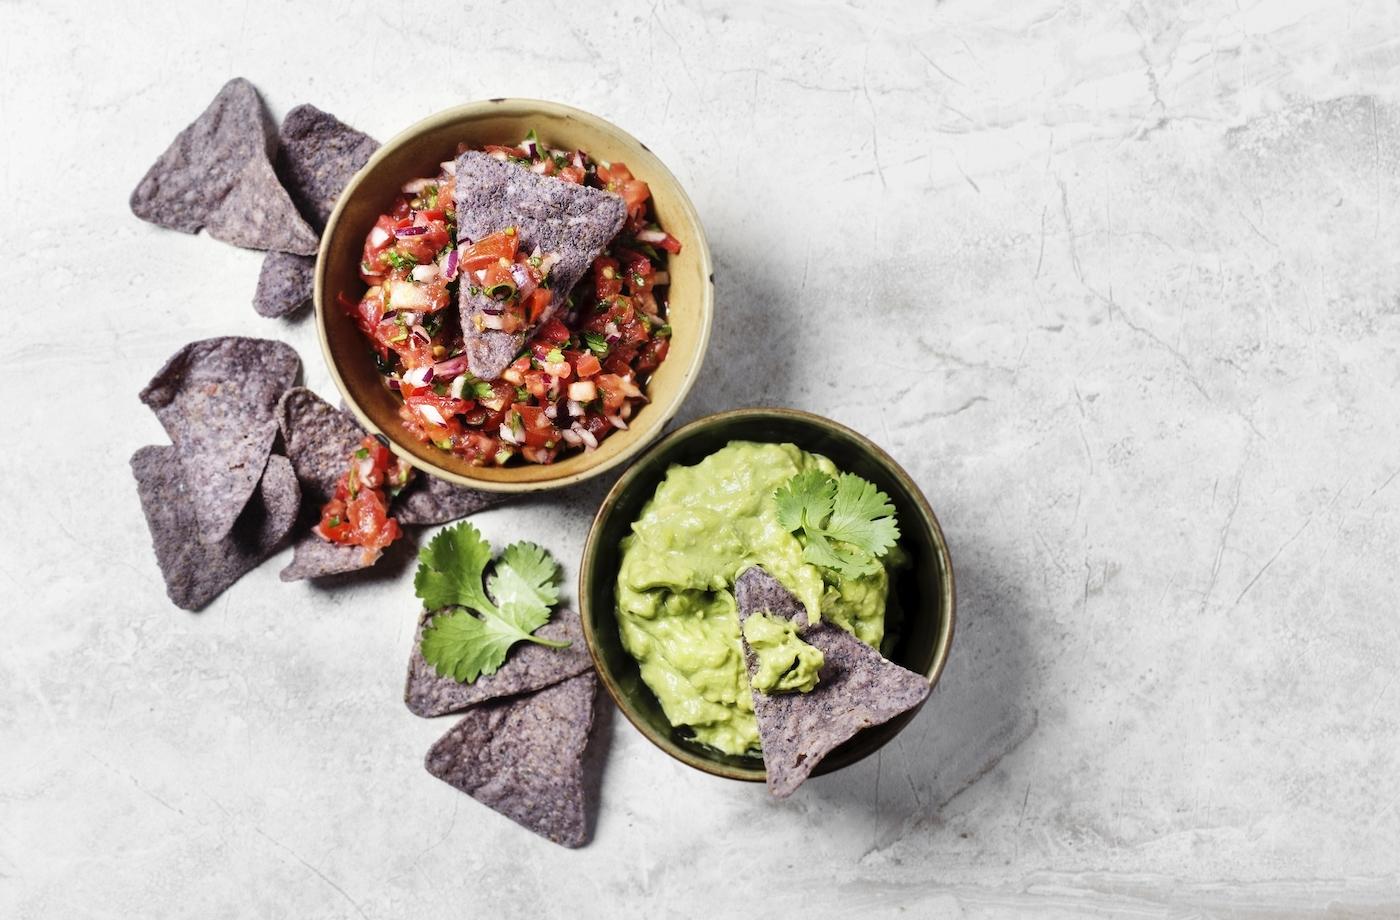 8 delicious, gut-friendly snacks that registered dietitians love